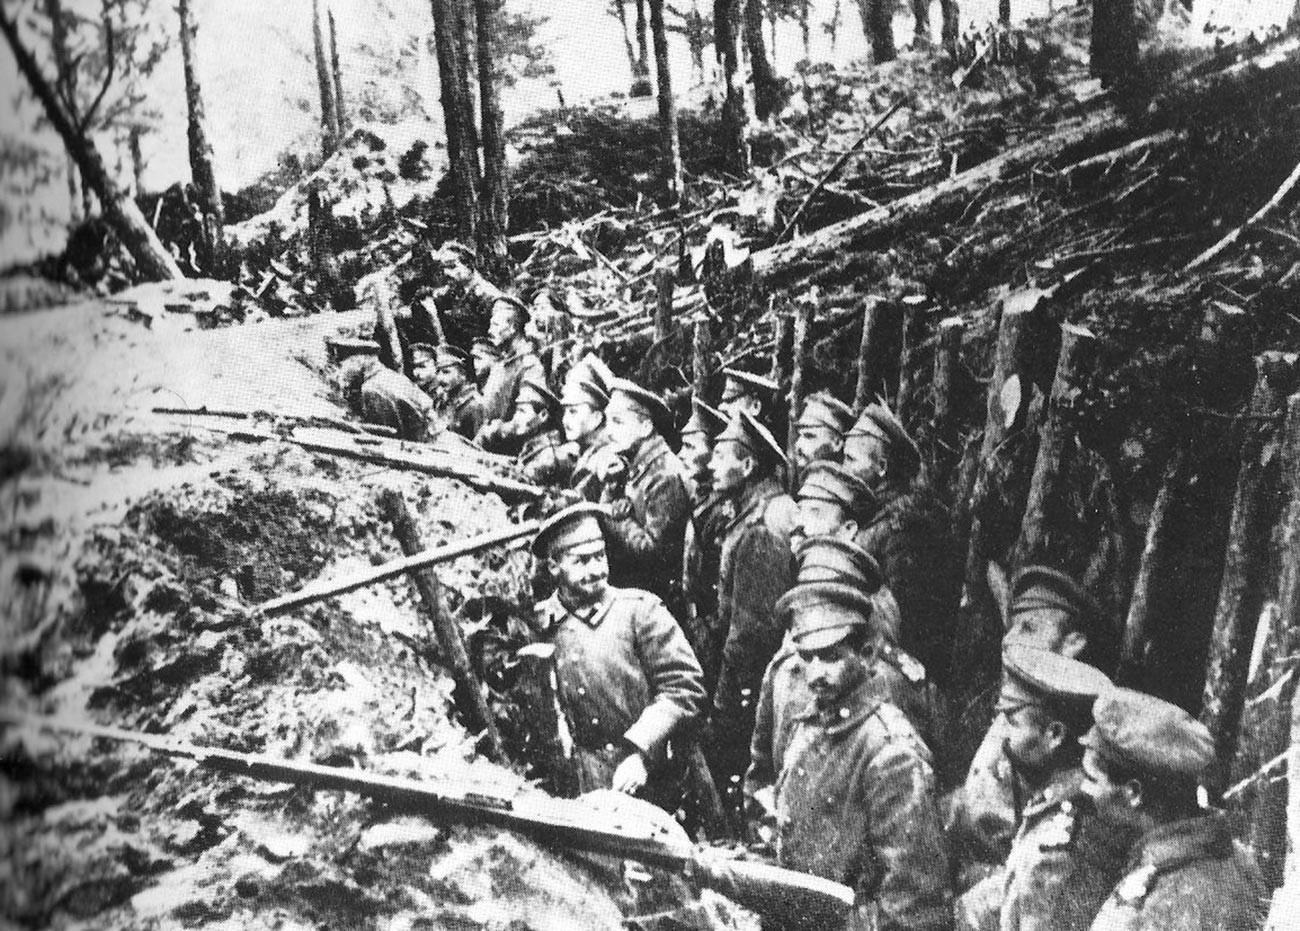 Trincheiras russas nas florestas de Sarikamish.